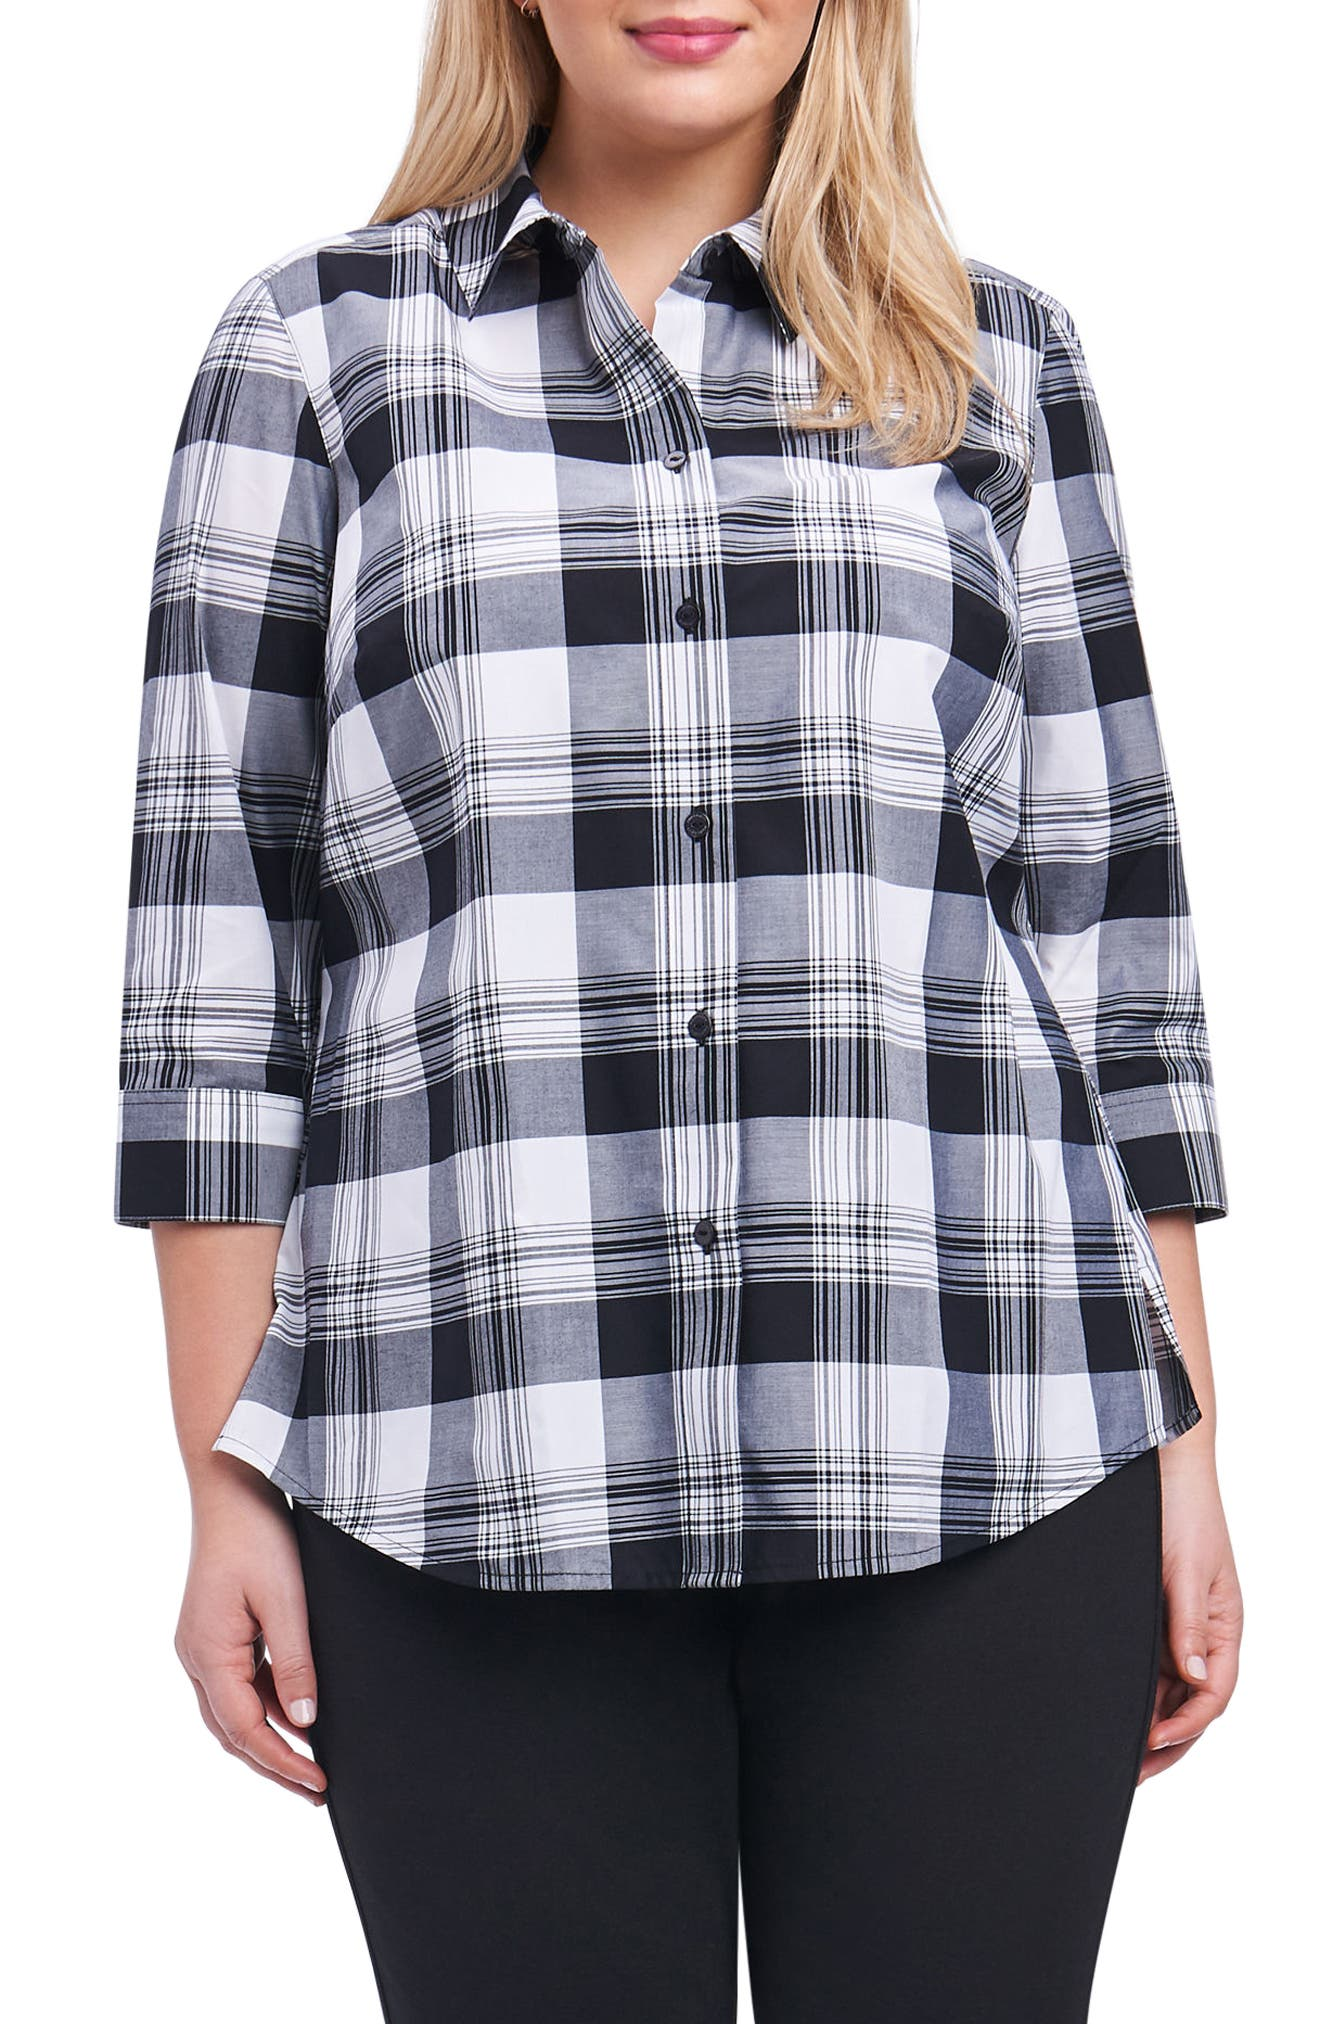 Sue Shaped Fit Plaid Shirt,                             Main thumbnail 1, color,                             010